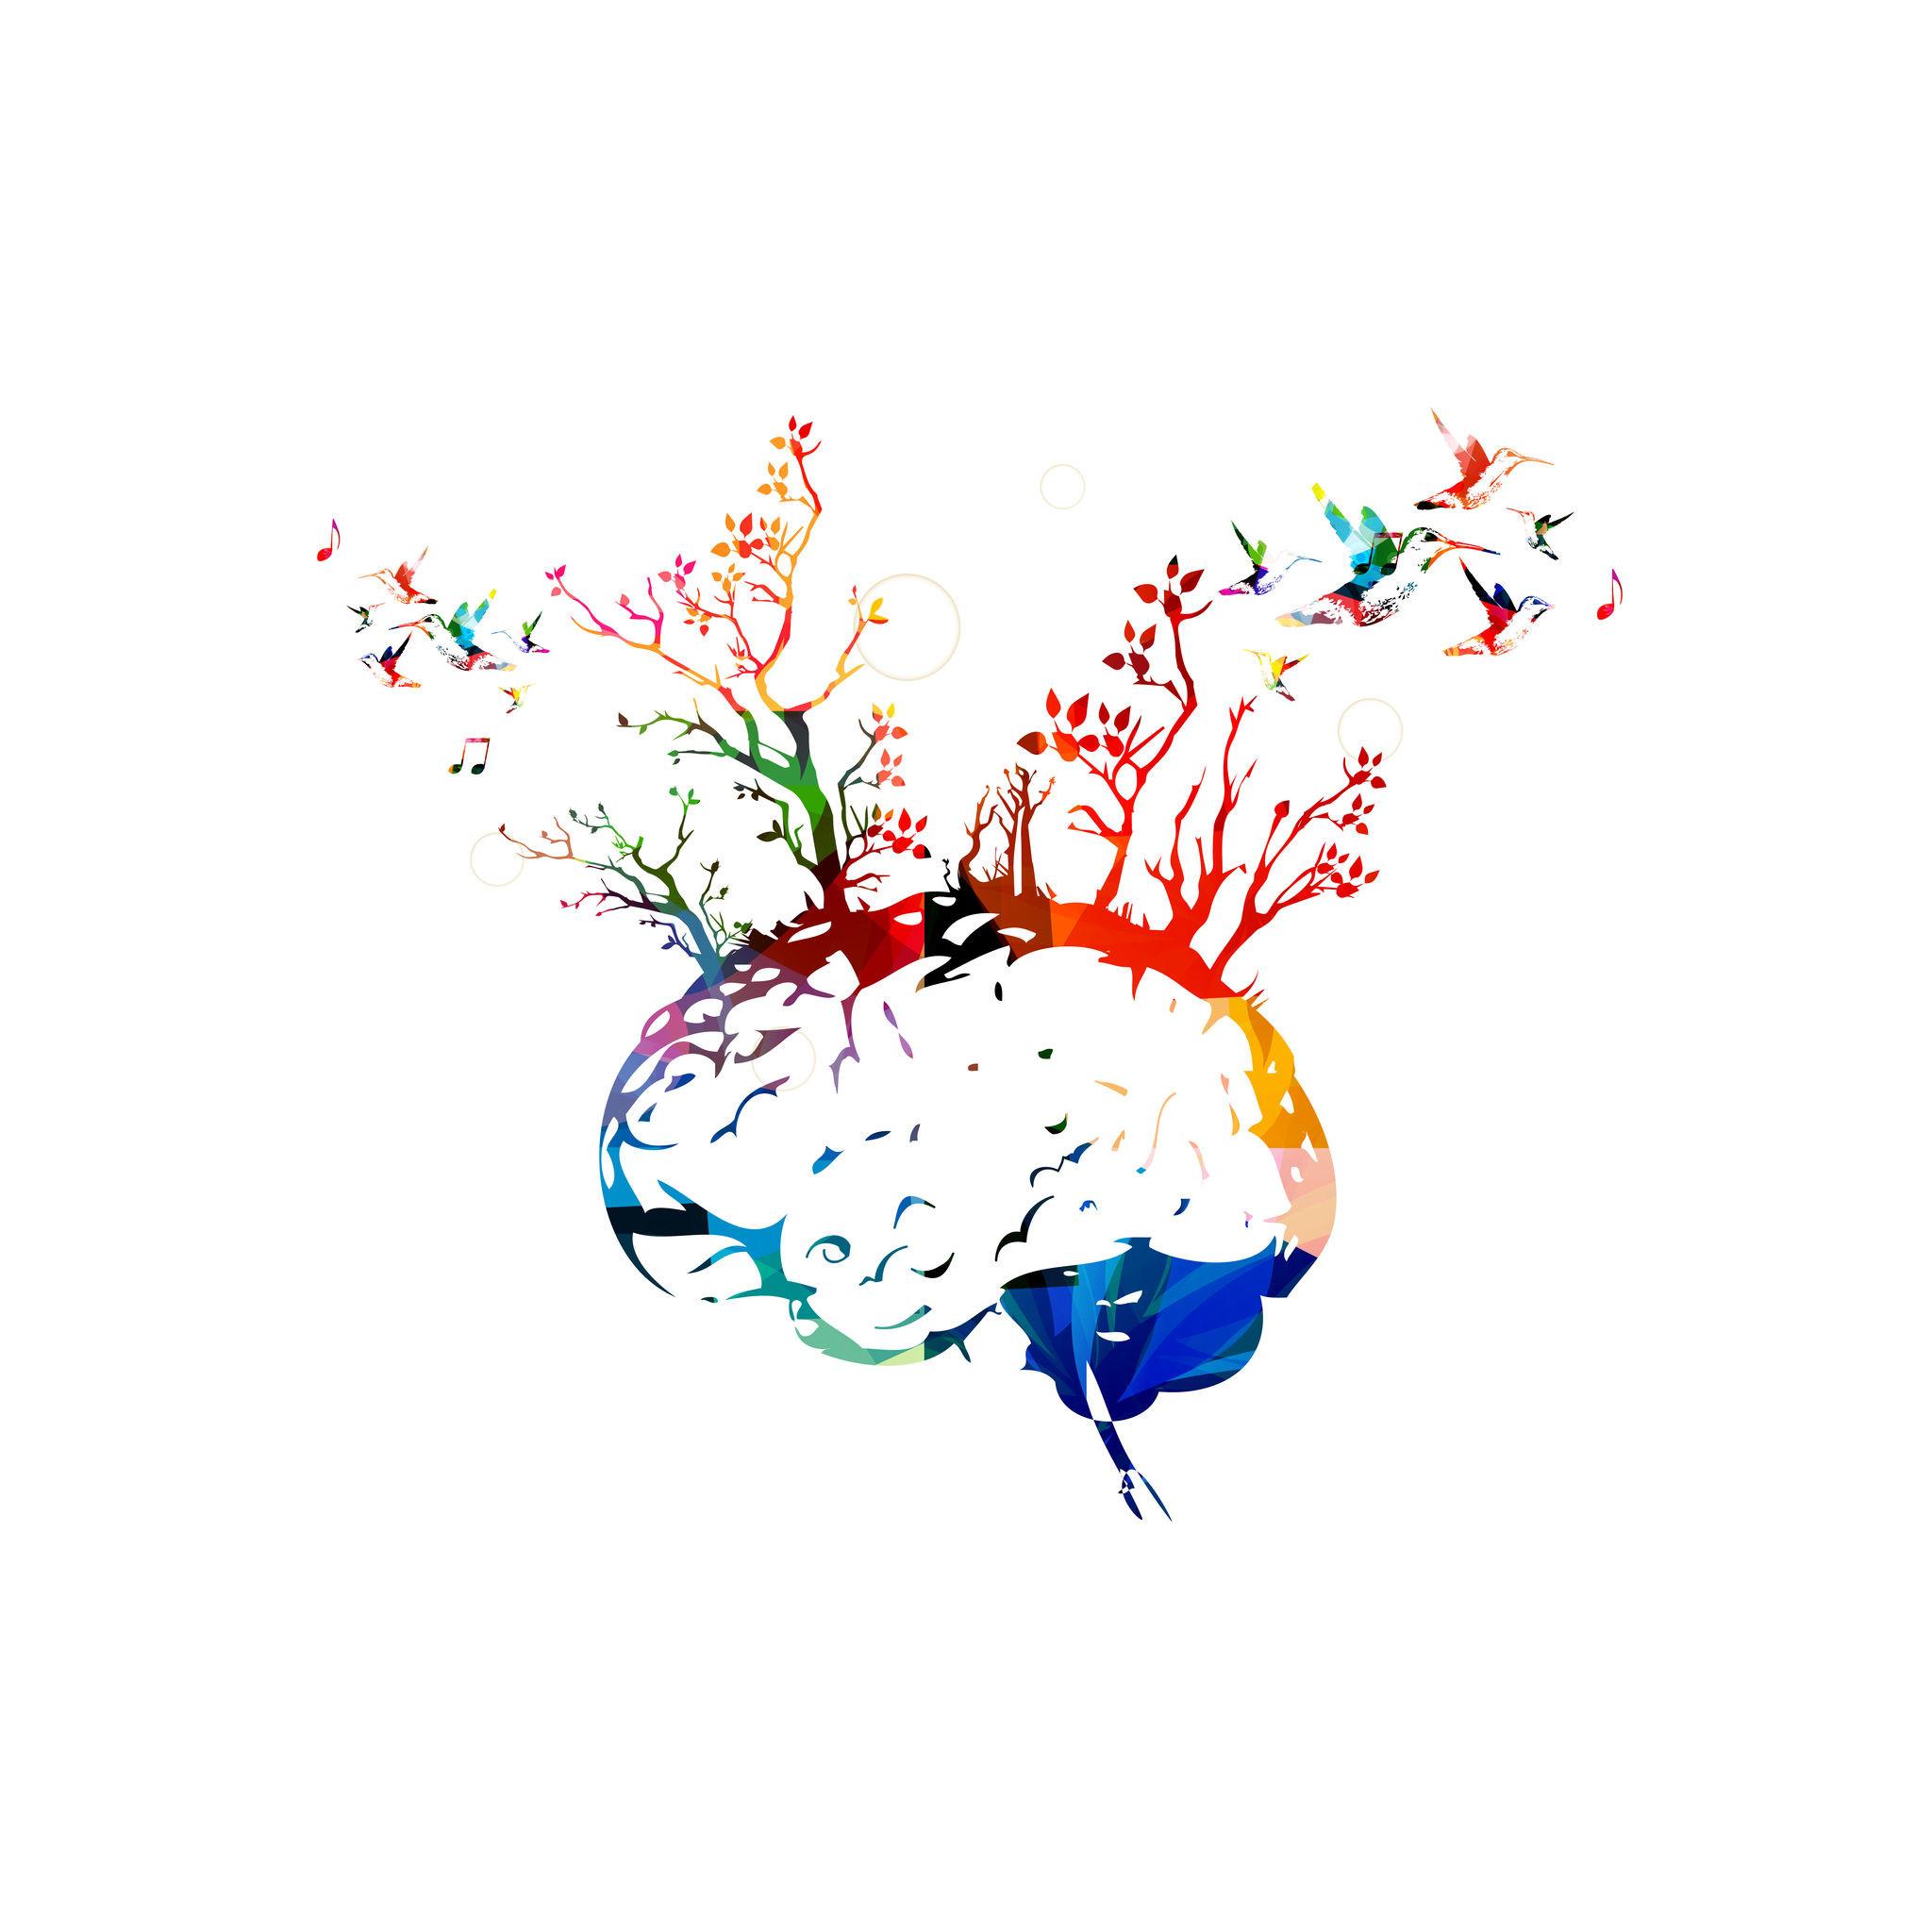 1-1 Therapeutic Art & Mentoring